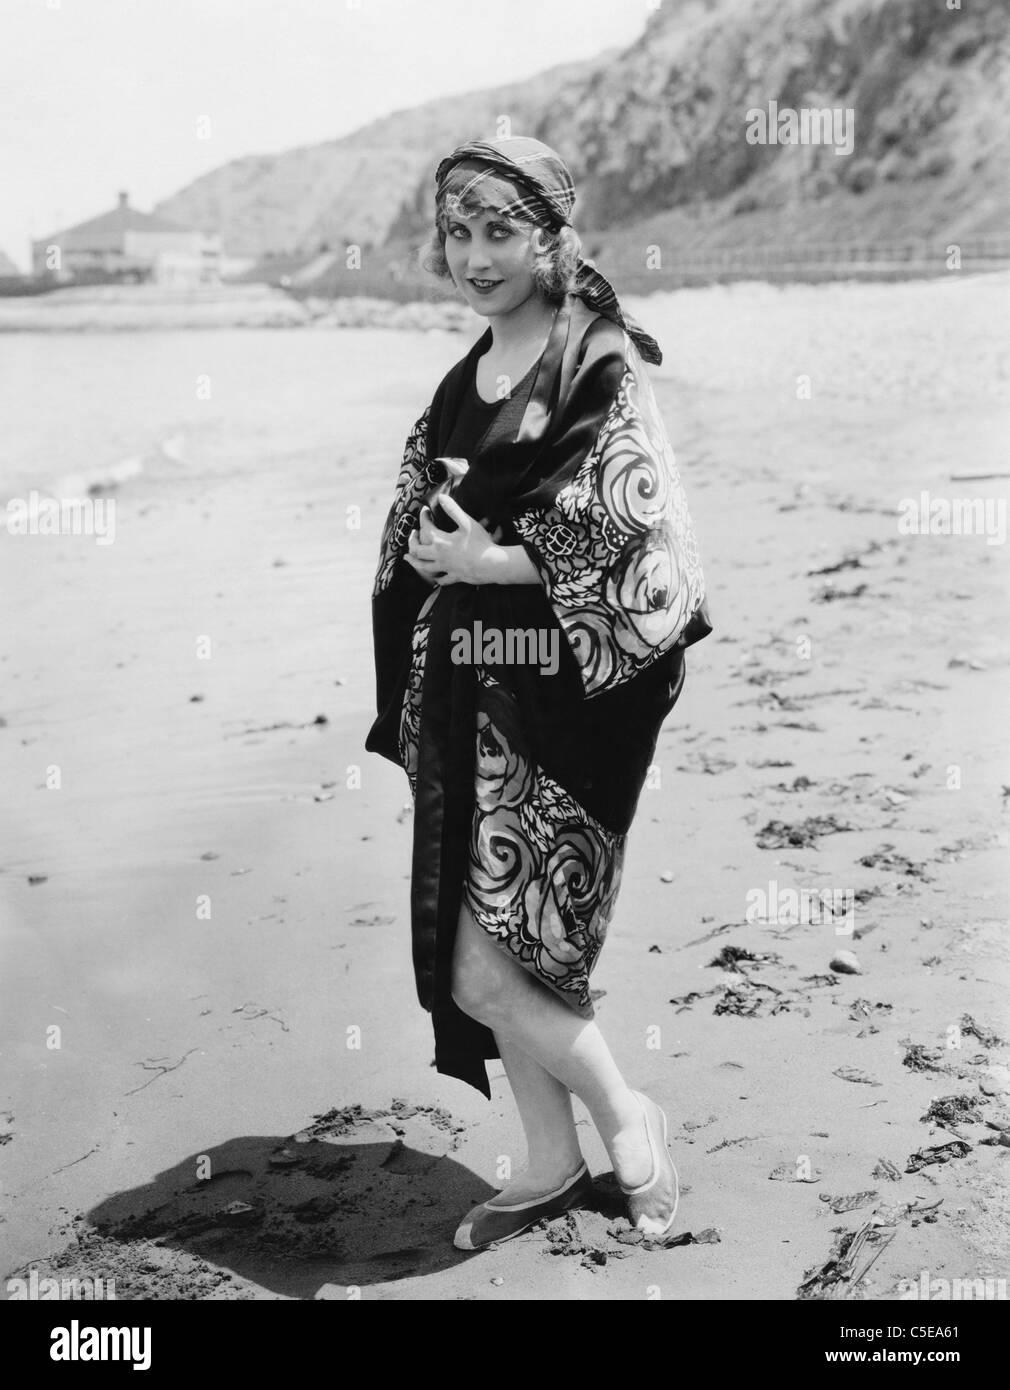 Woman in kimono on beach - Stock Image